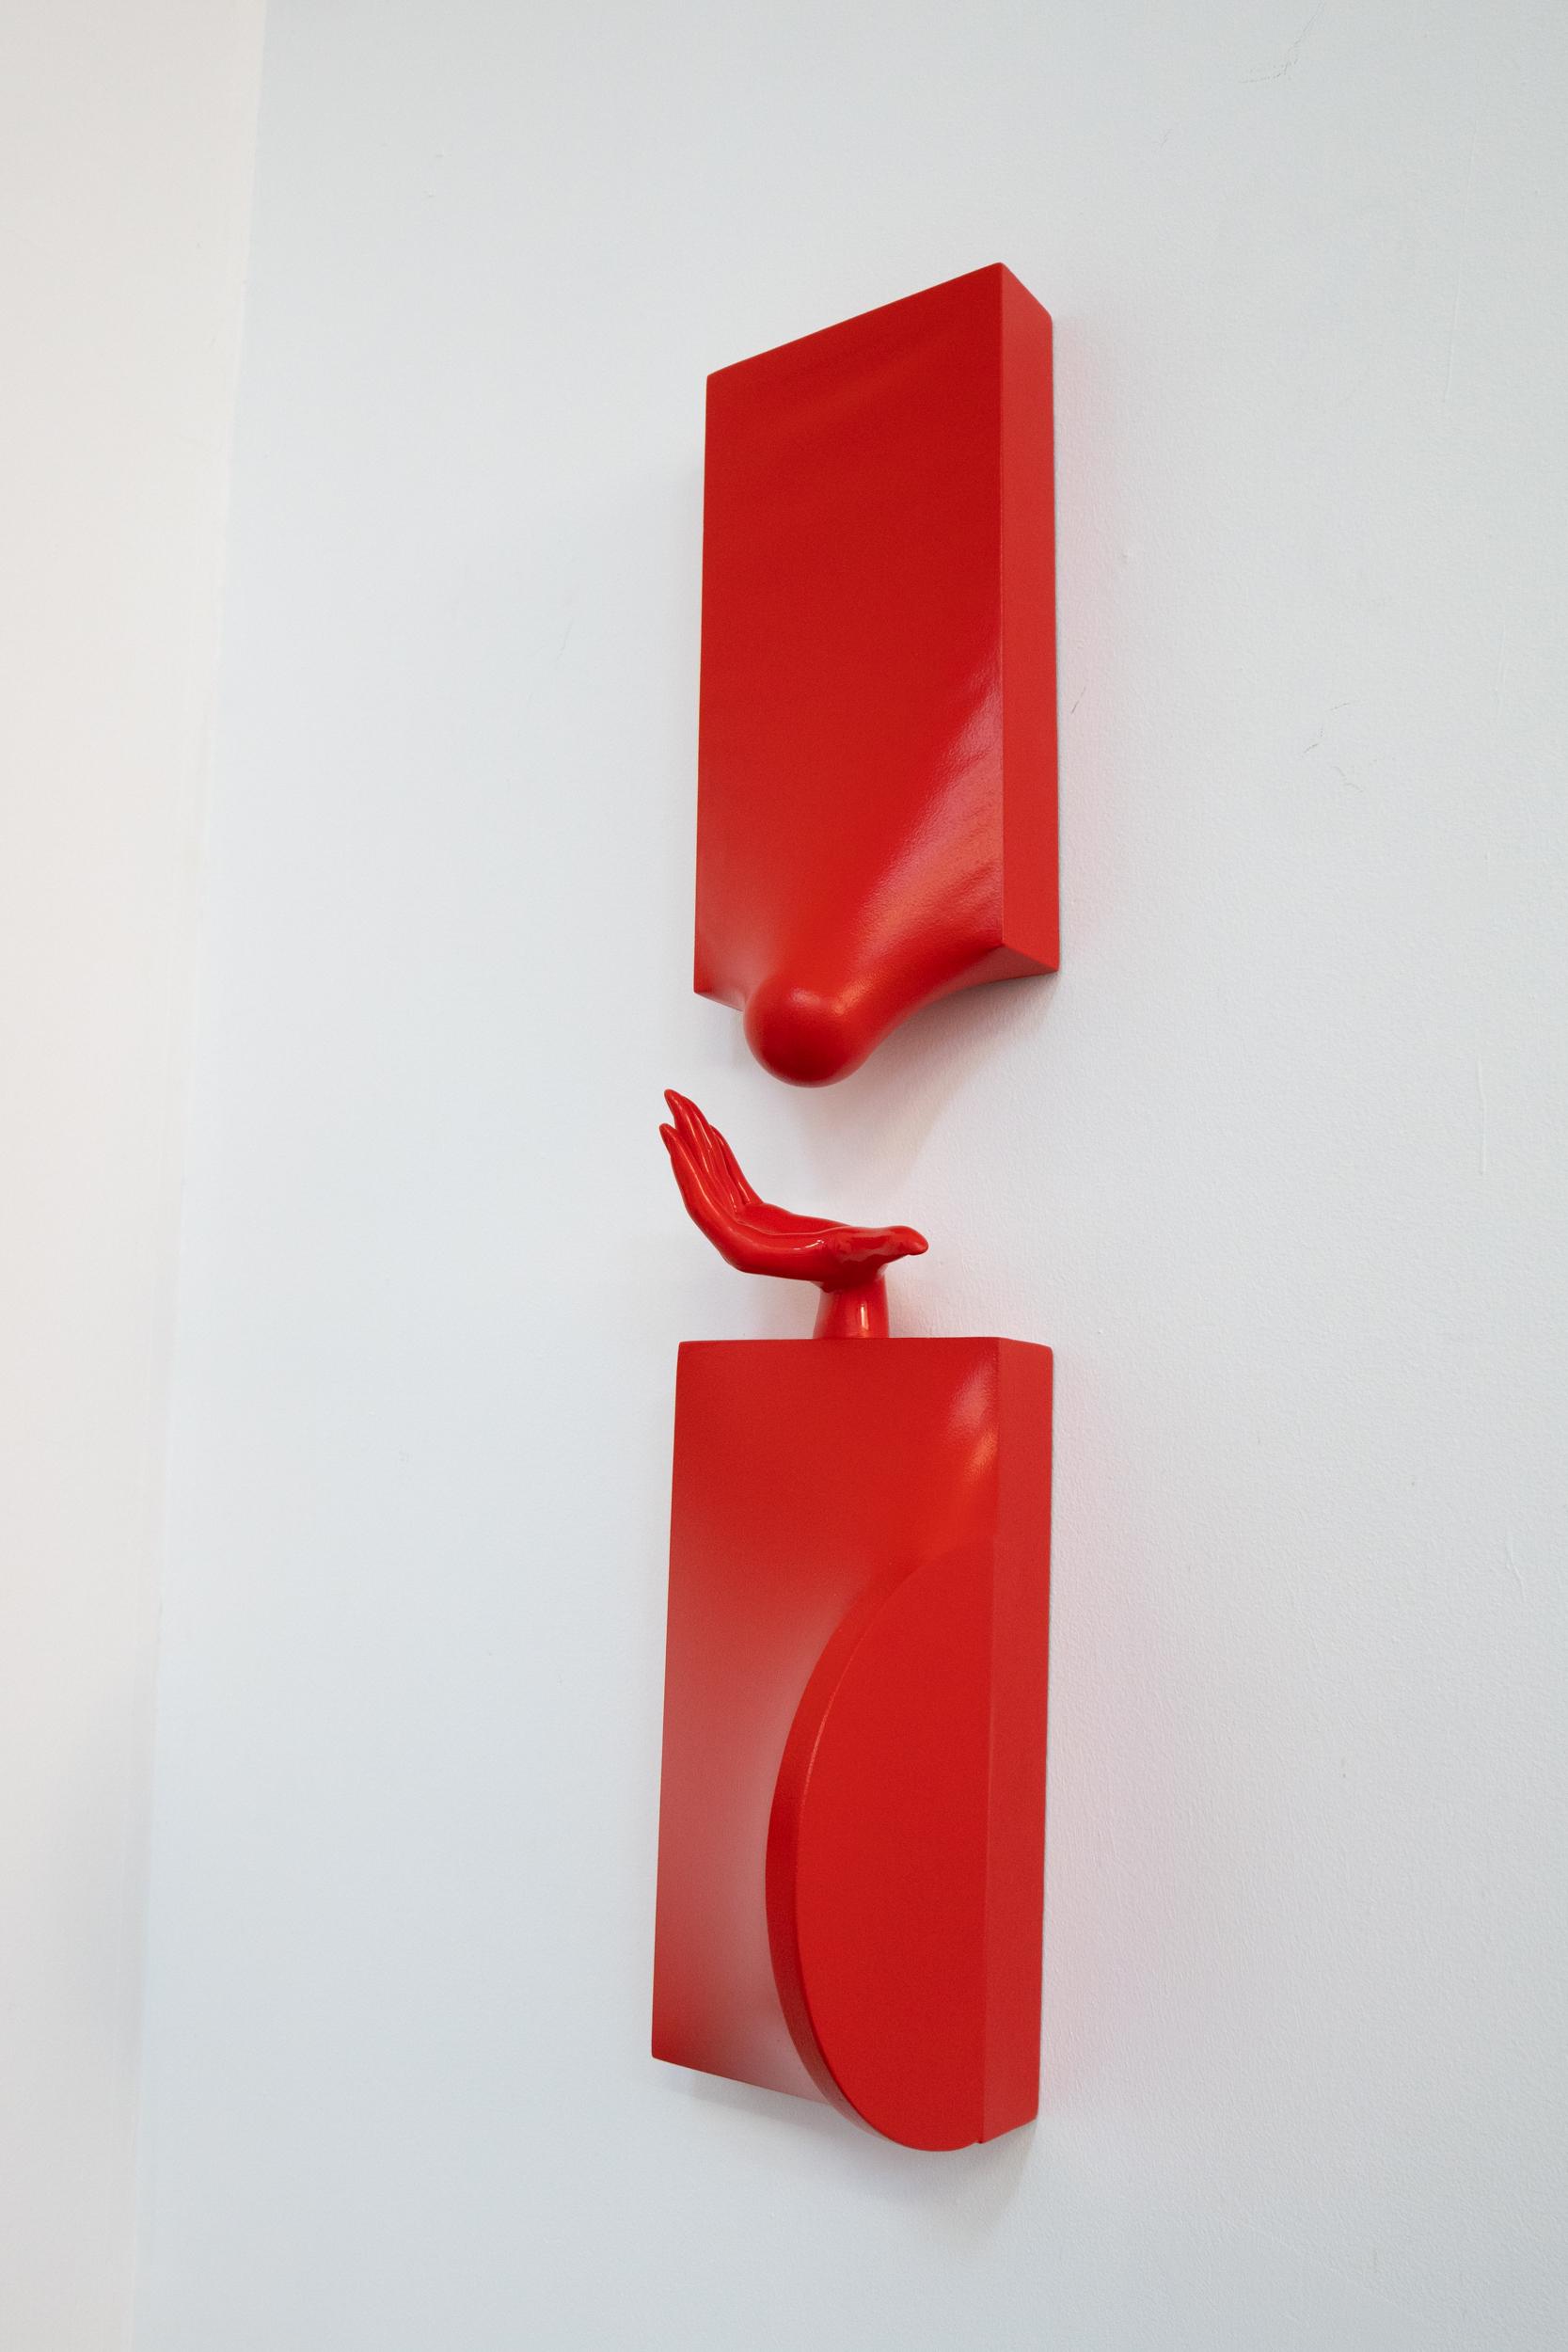 Red Gesture II by Samantha McCurdy